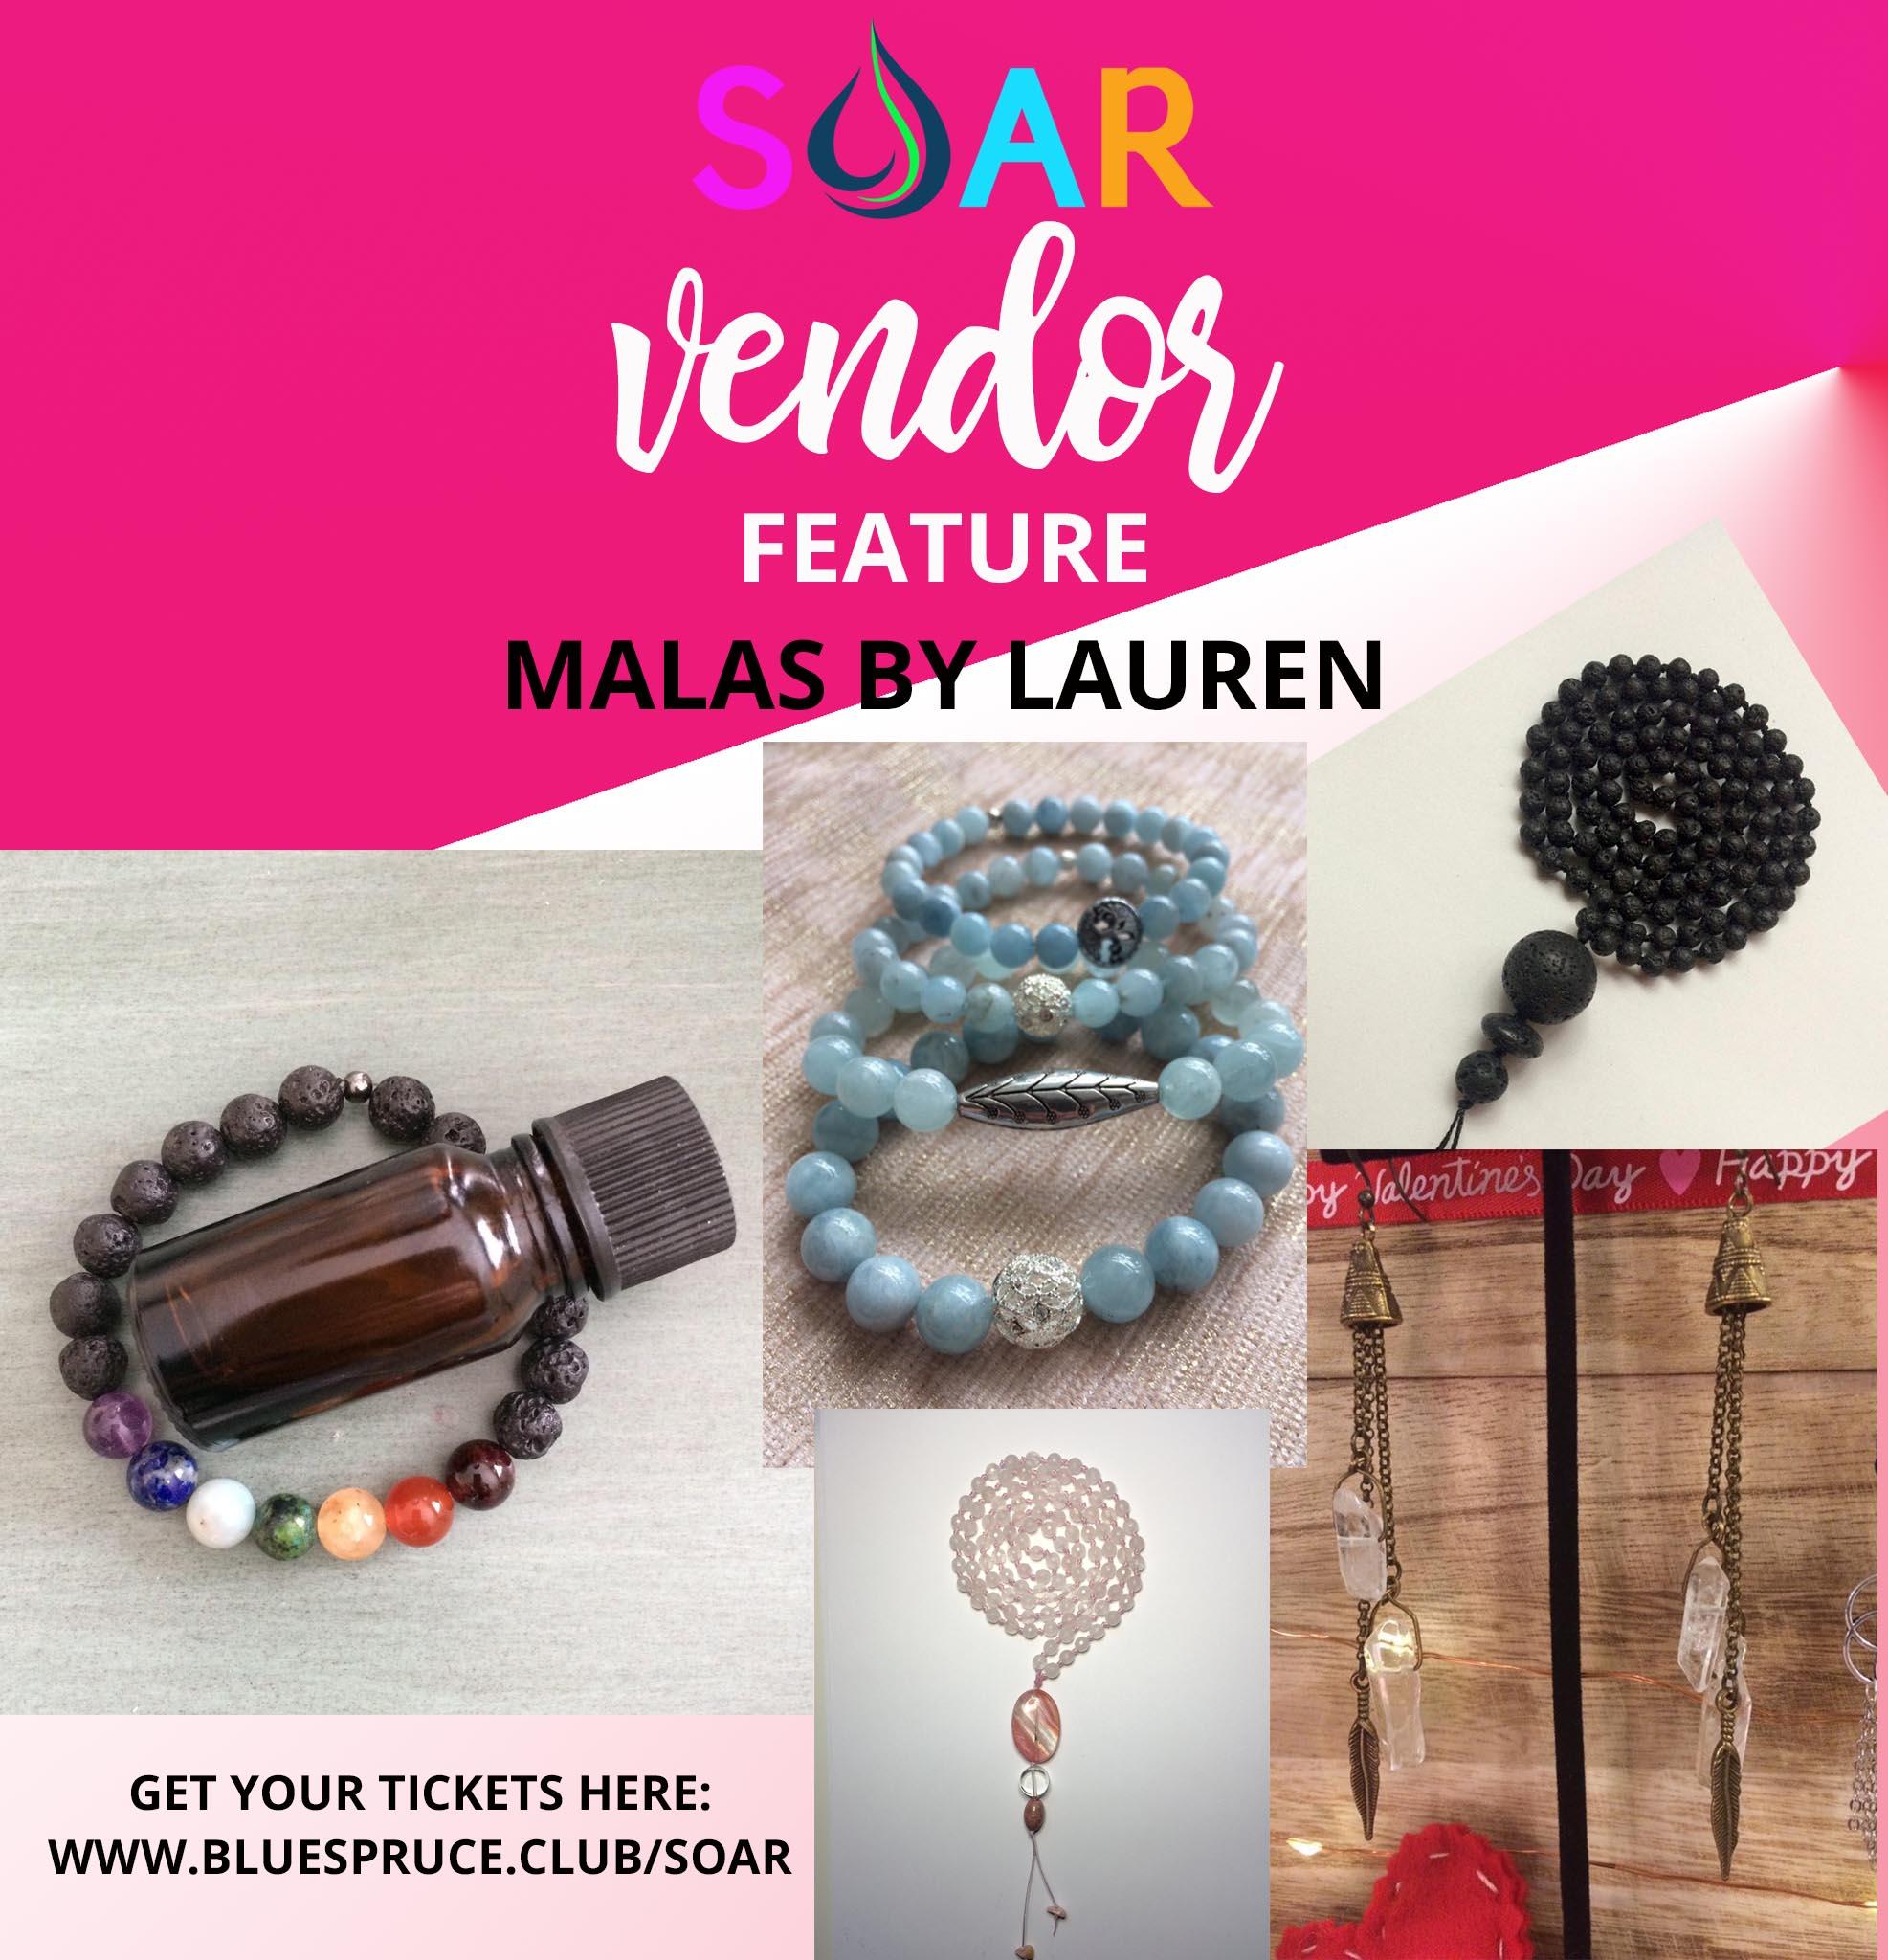 SOAR Vendor feature Malas by Lauren.jpg